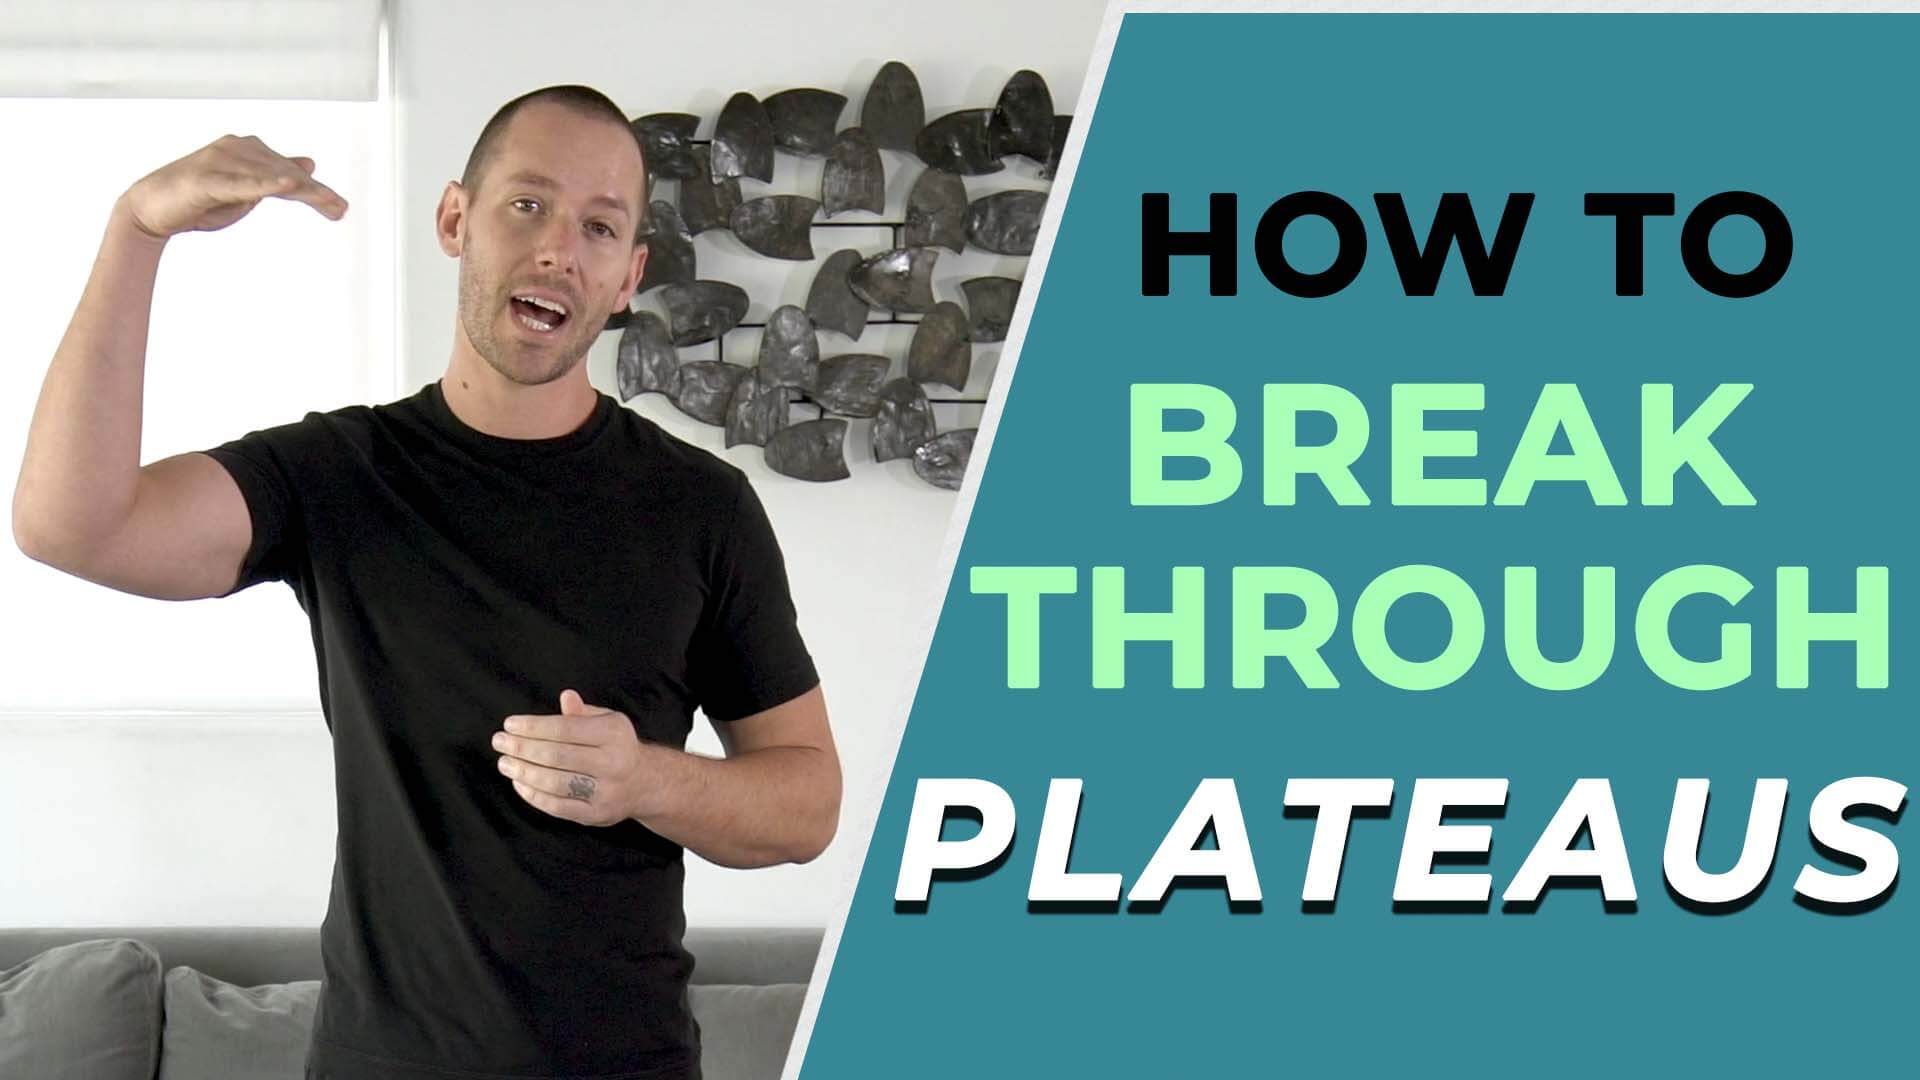 how-to-break-through-plateaus